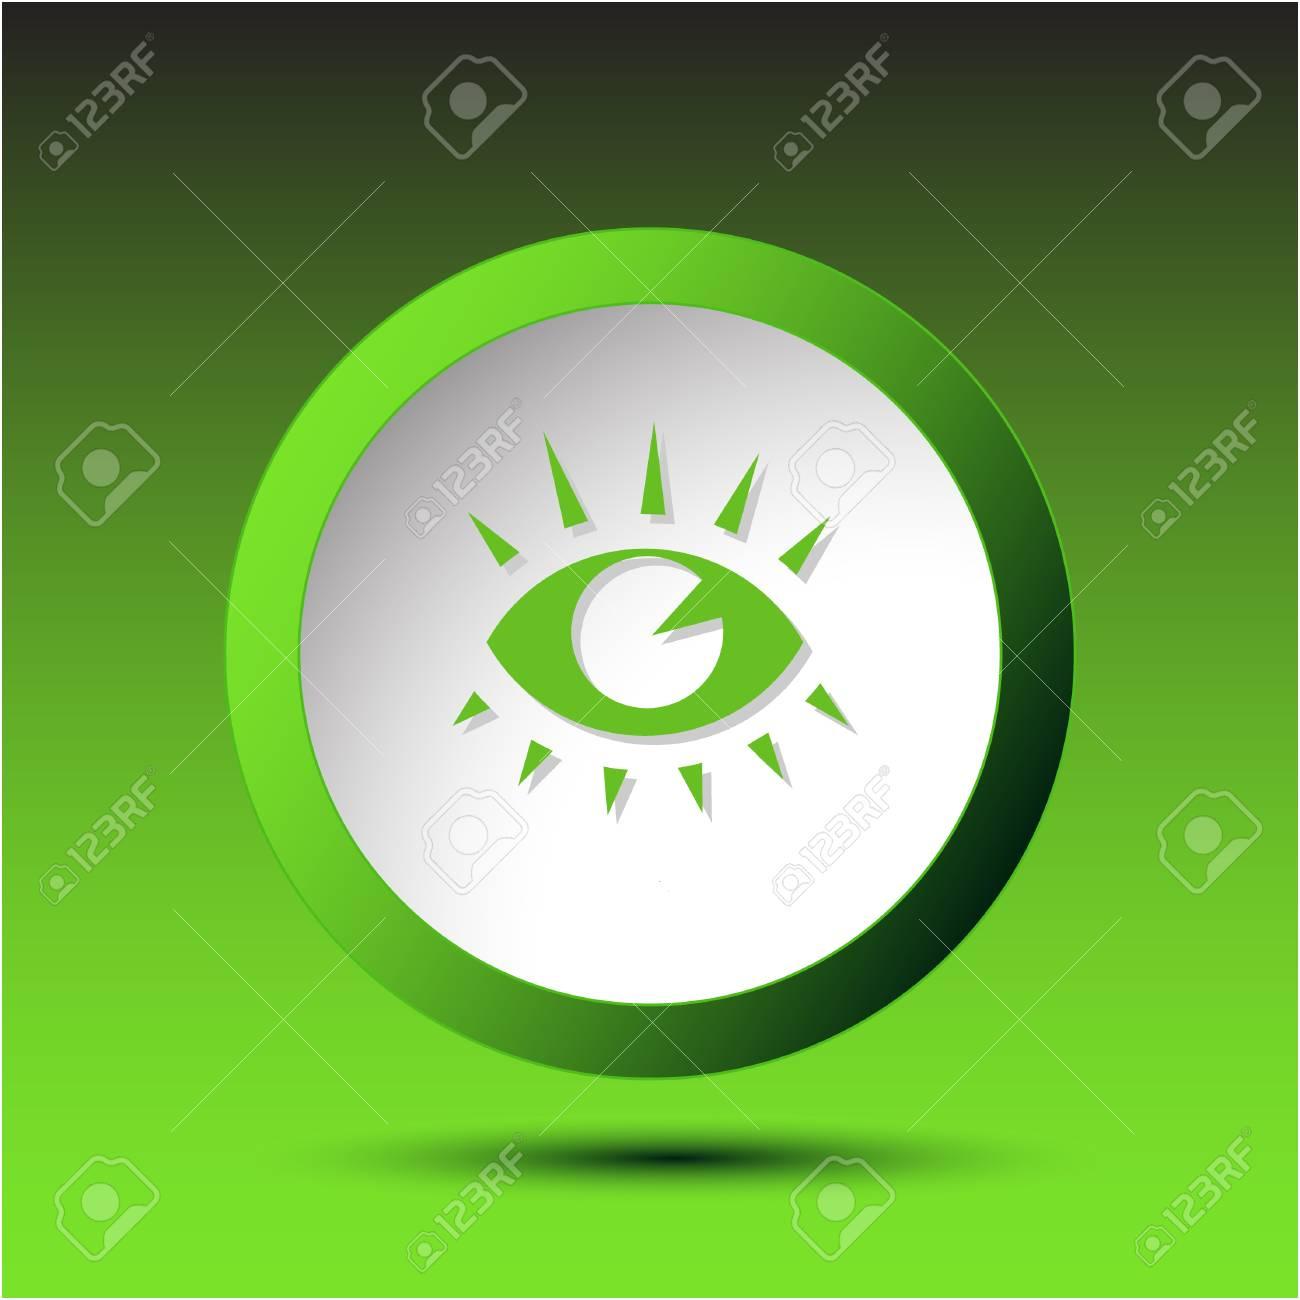 . Plastic button. Vector illustration. Stock Vector - 25302232